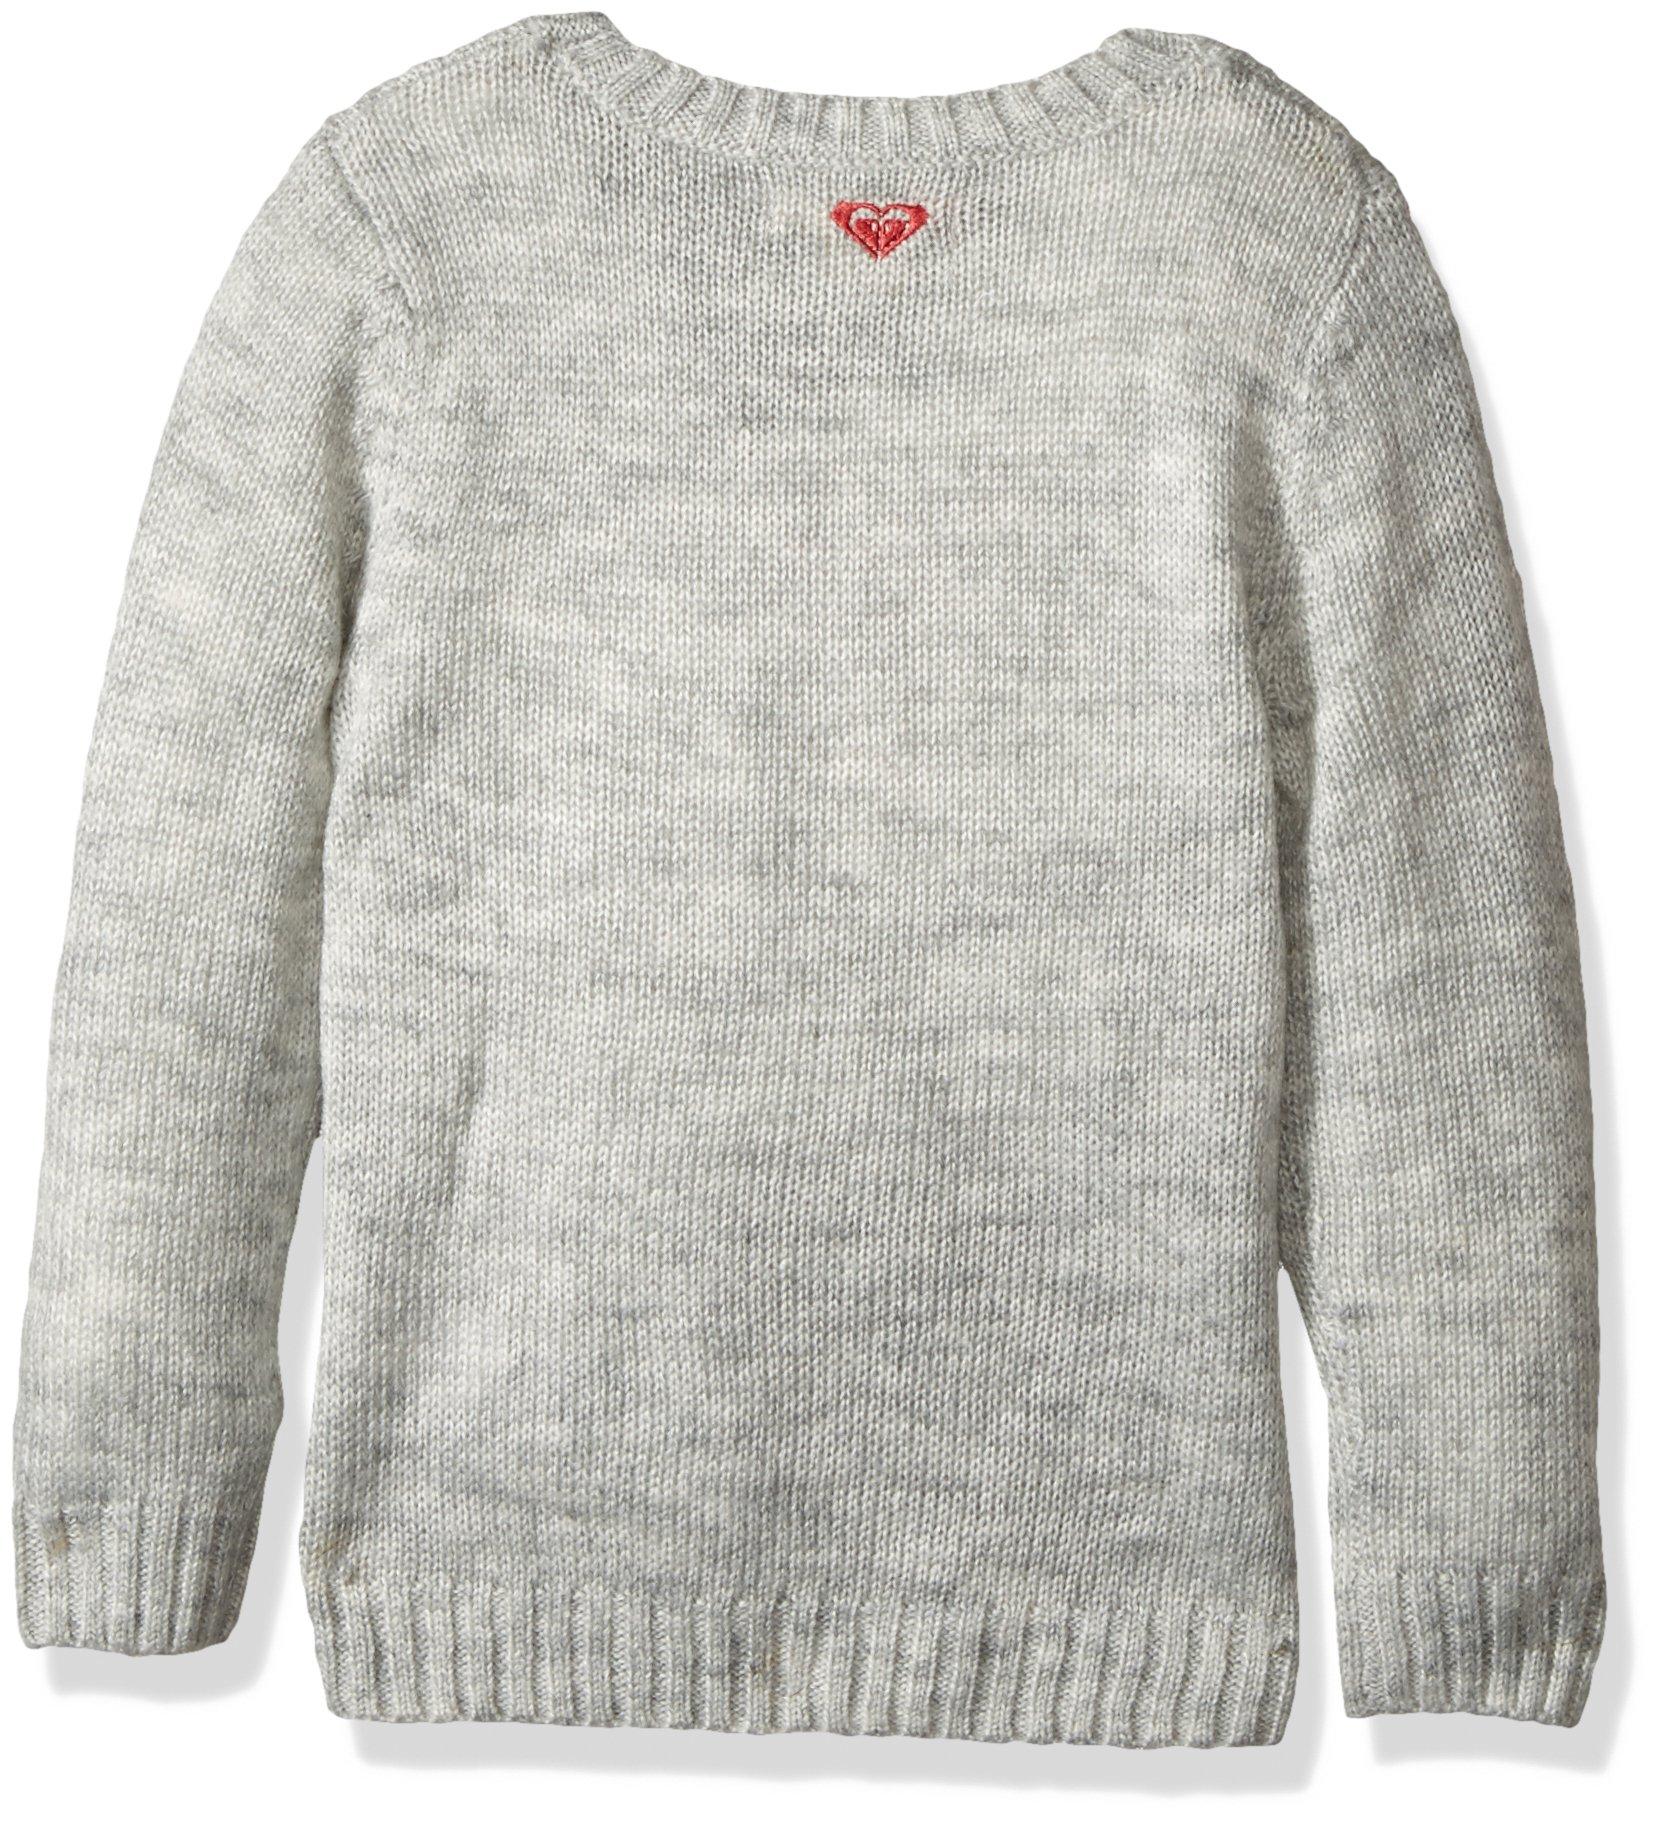 Roxy Girls' Little Daisy Tales Sweater, Heritage Heather 7 by Roxy (Image #2)